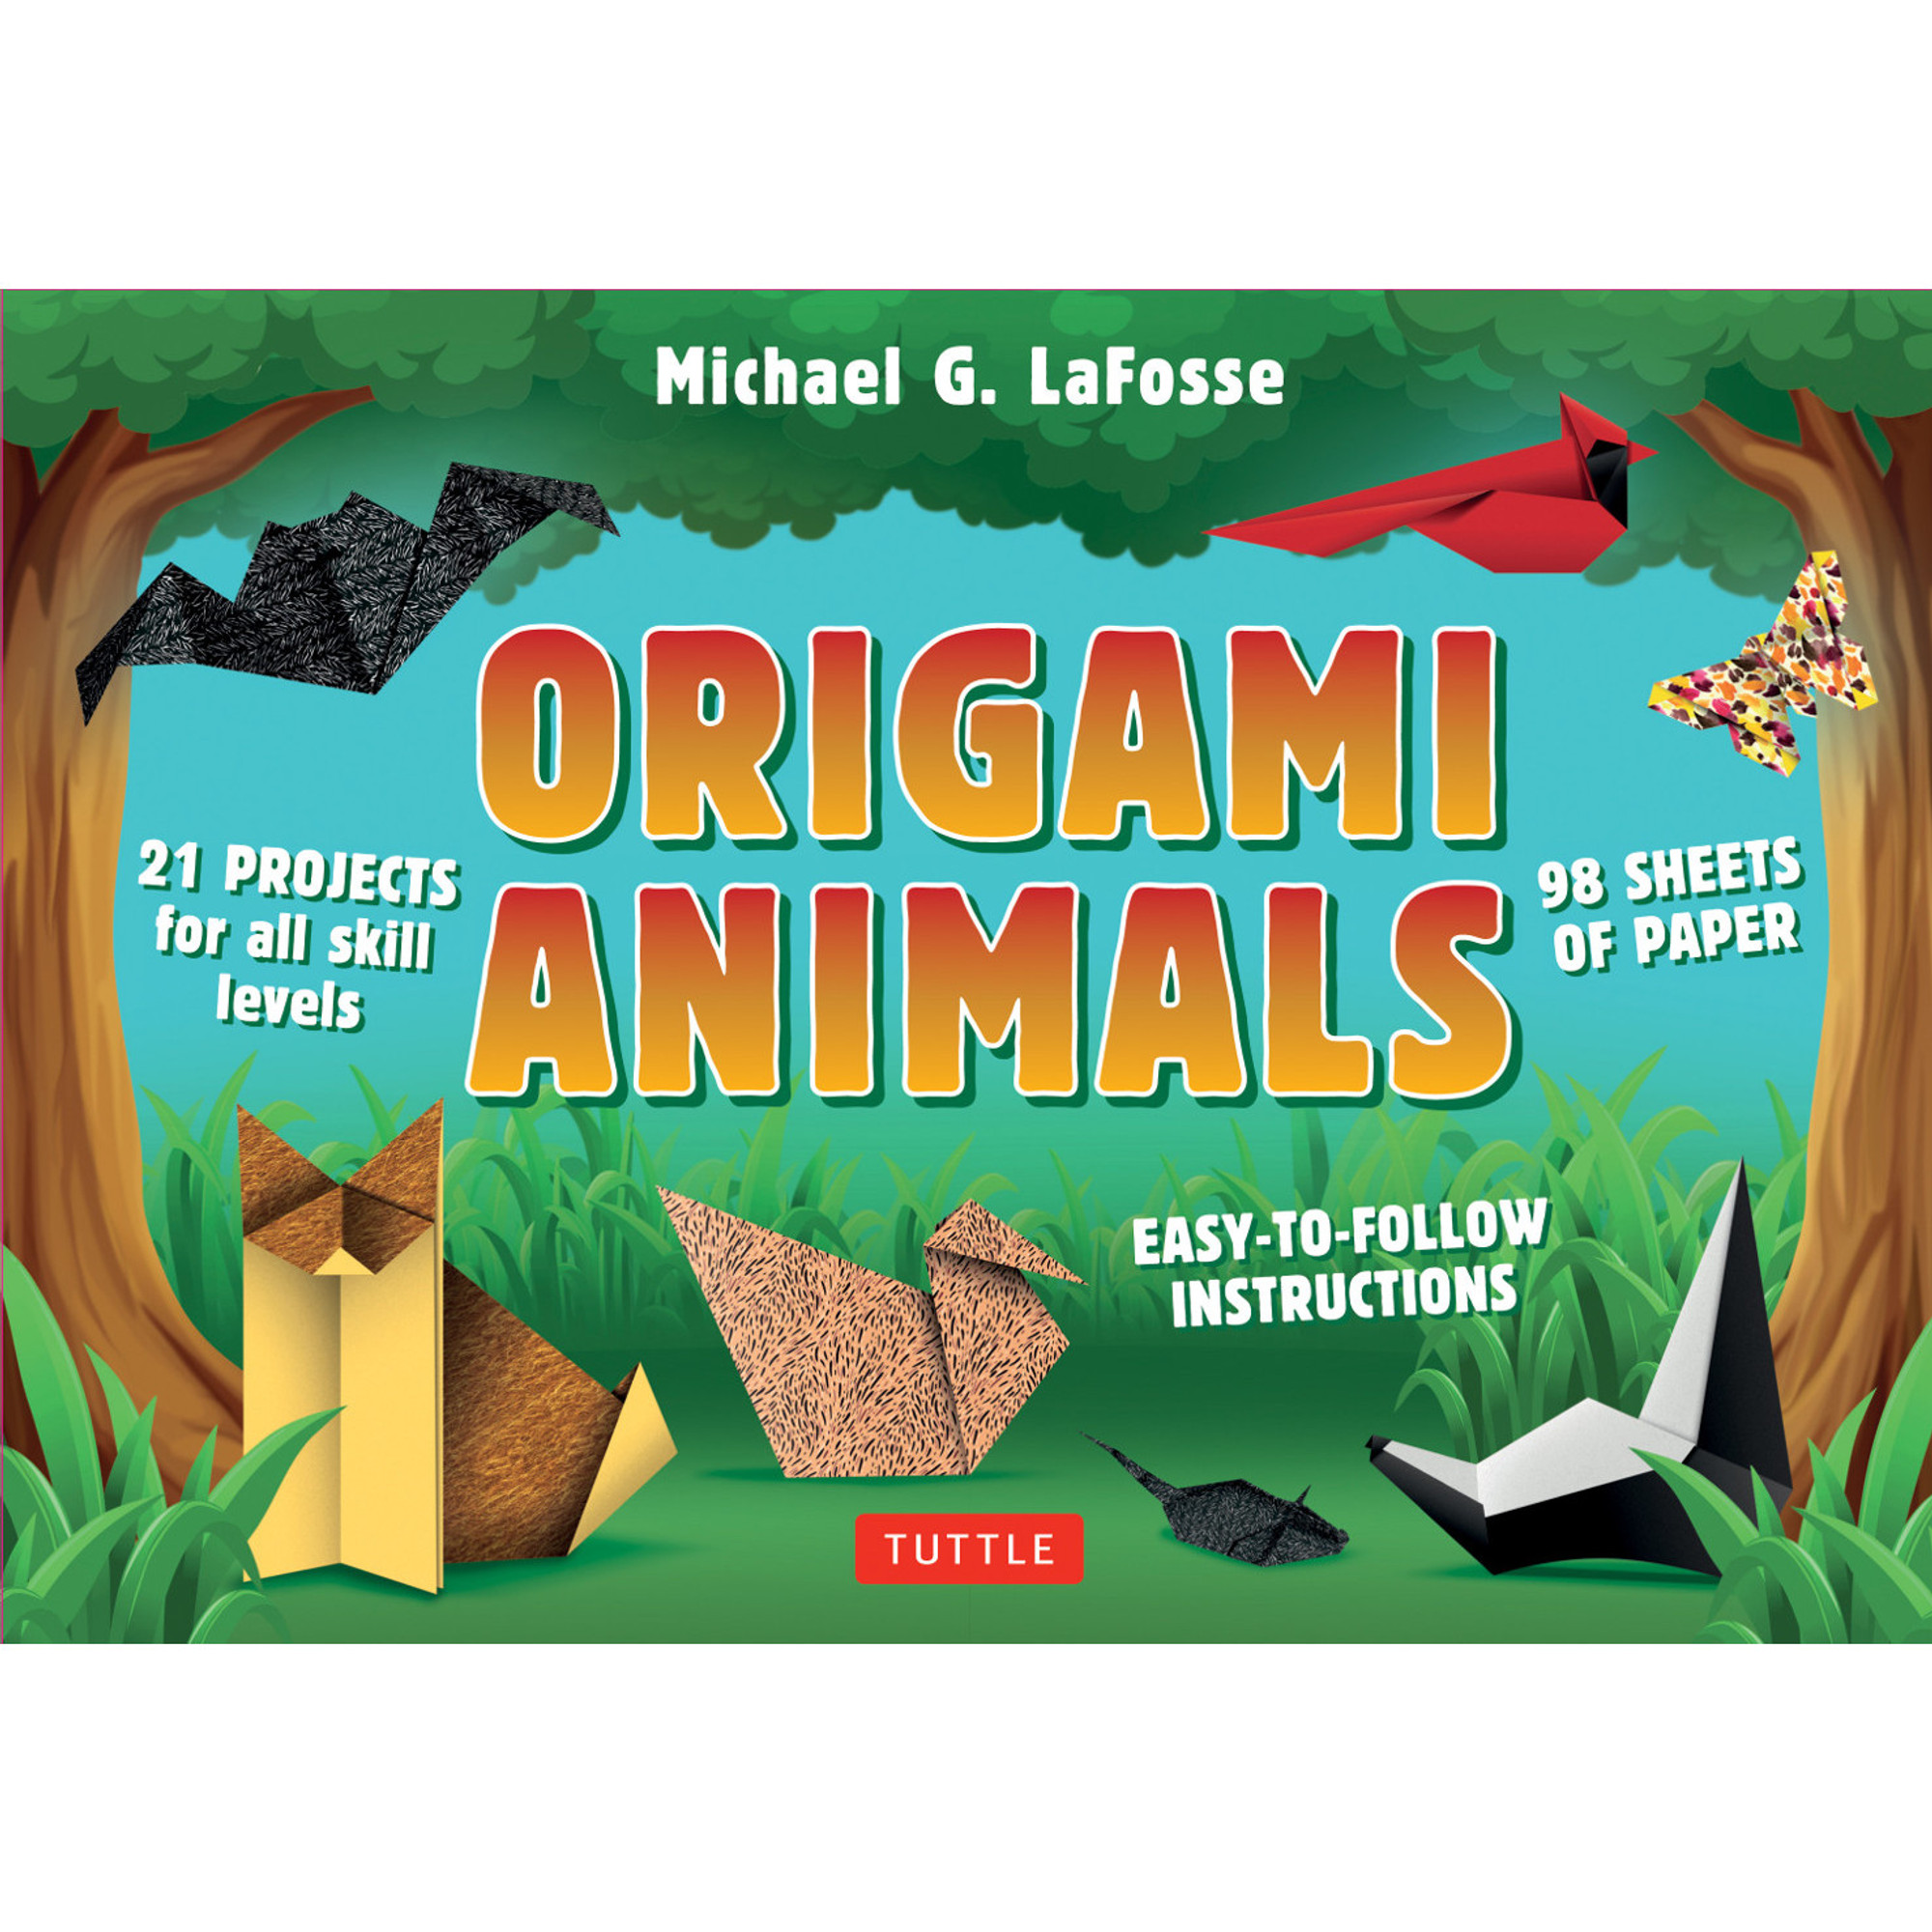 Origami fox easy tutorial zoo animals 3d instructions.Origami ...   2000x2000